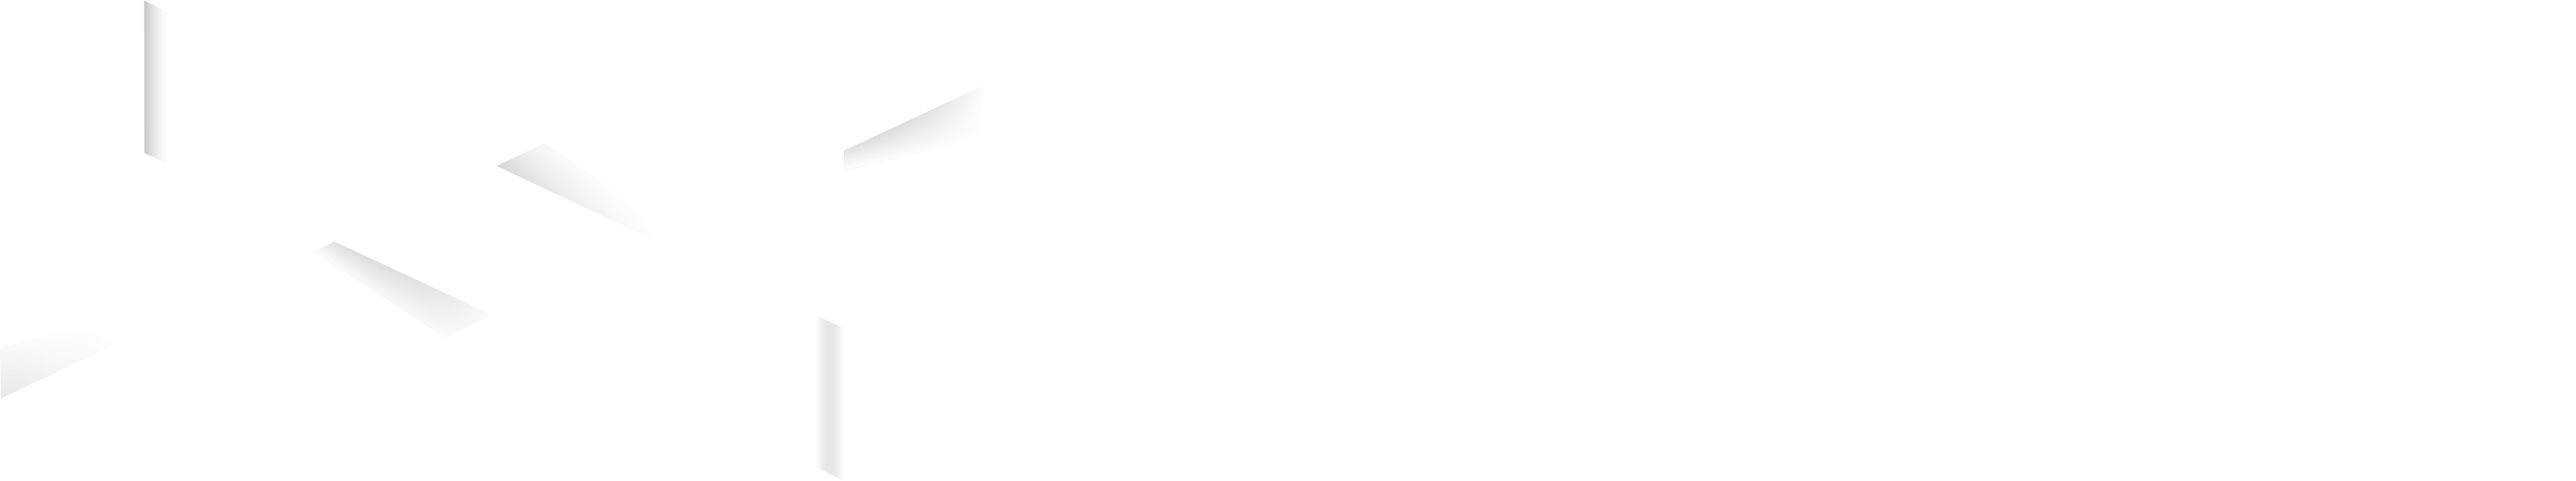 HCL Software DevOps